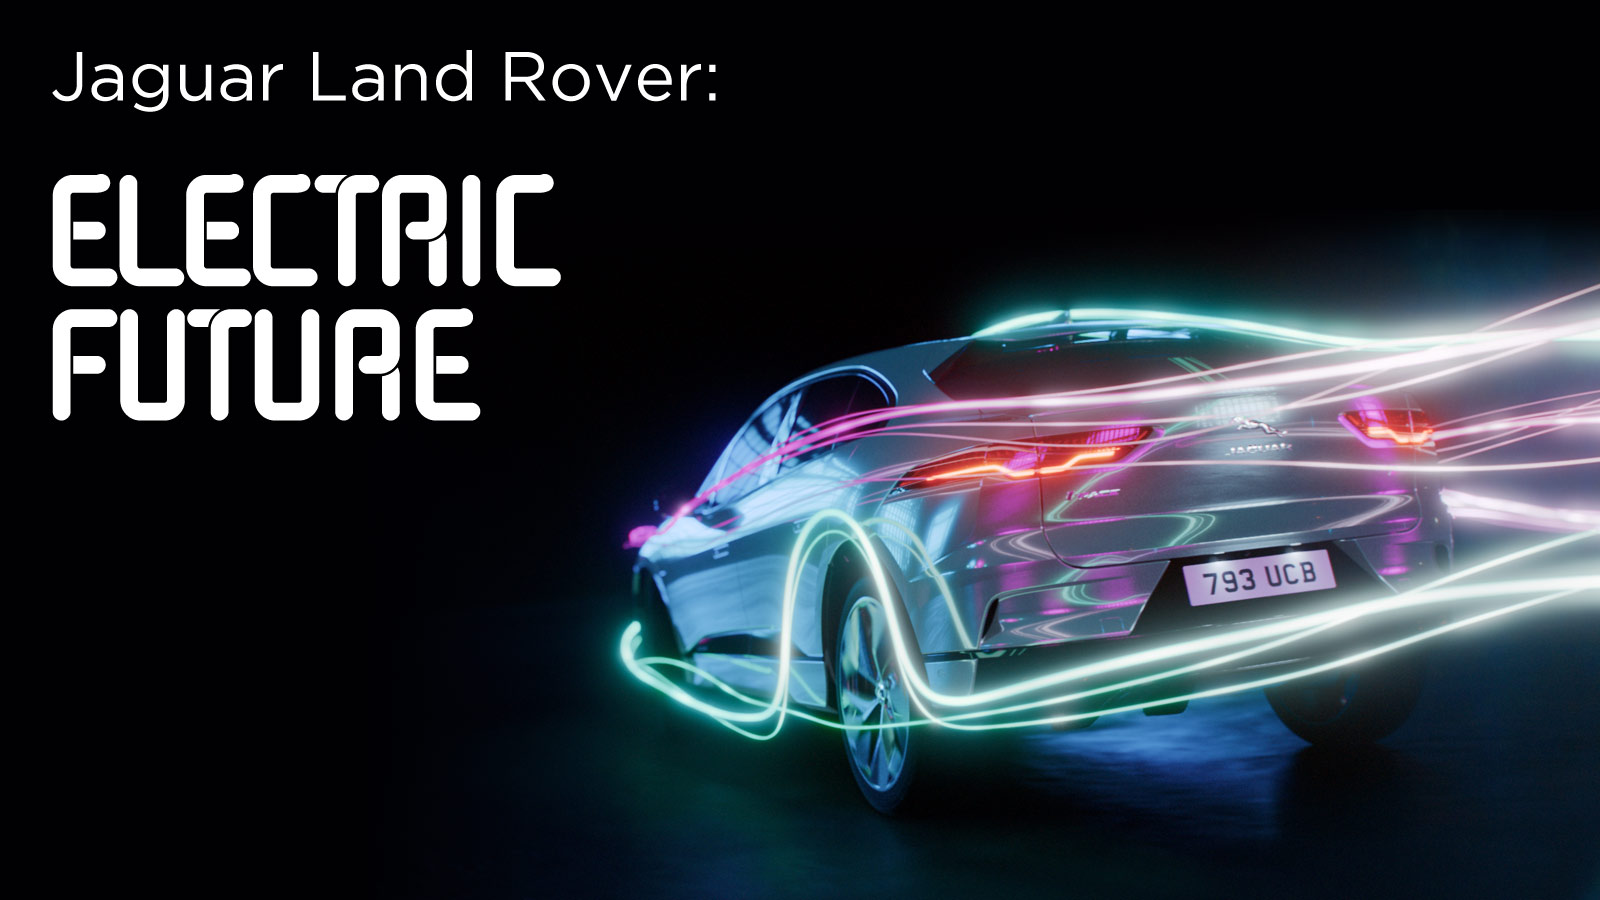 Jaguar Land Rover Electric Future